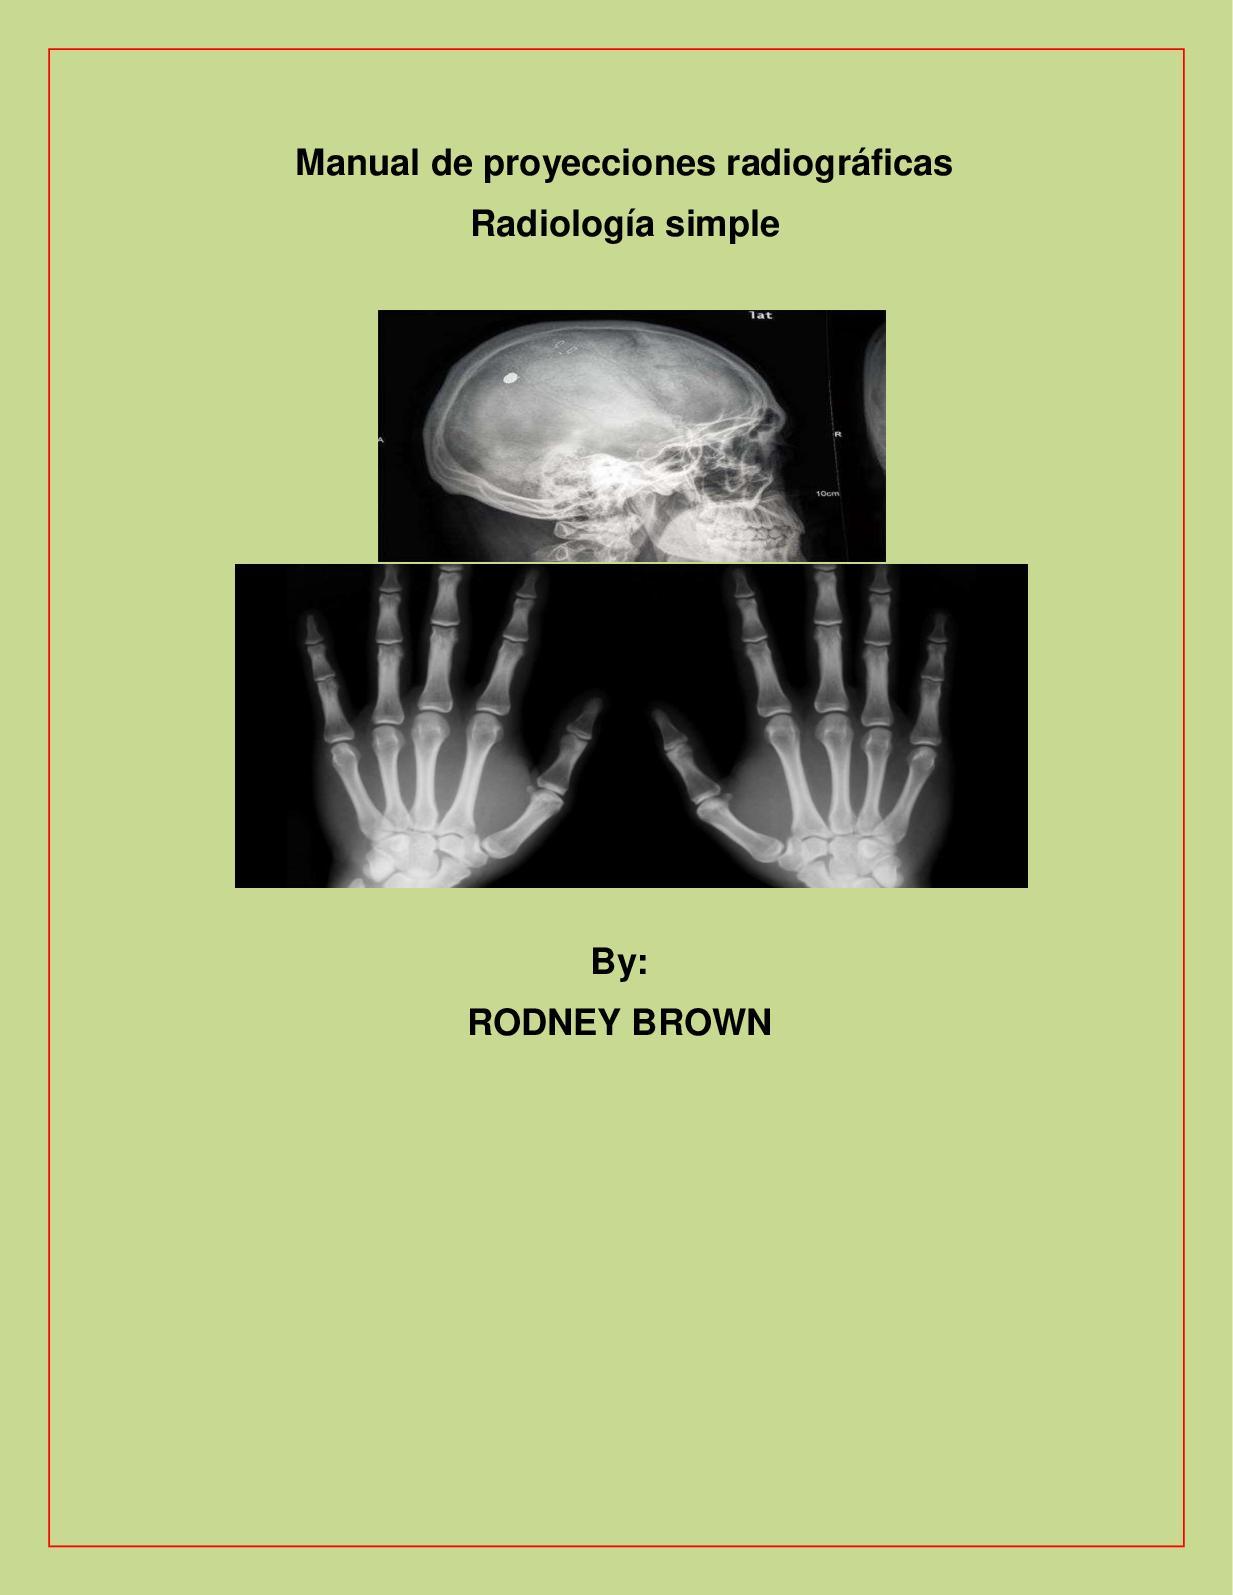 Manual De Radiologia by rodney brown